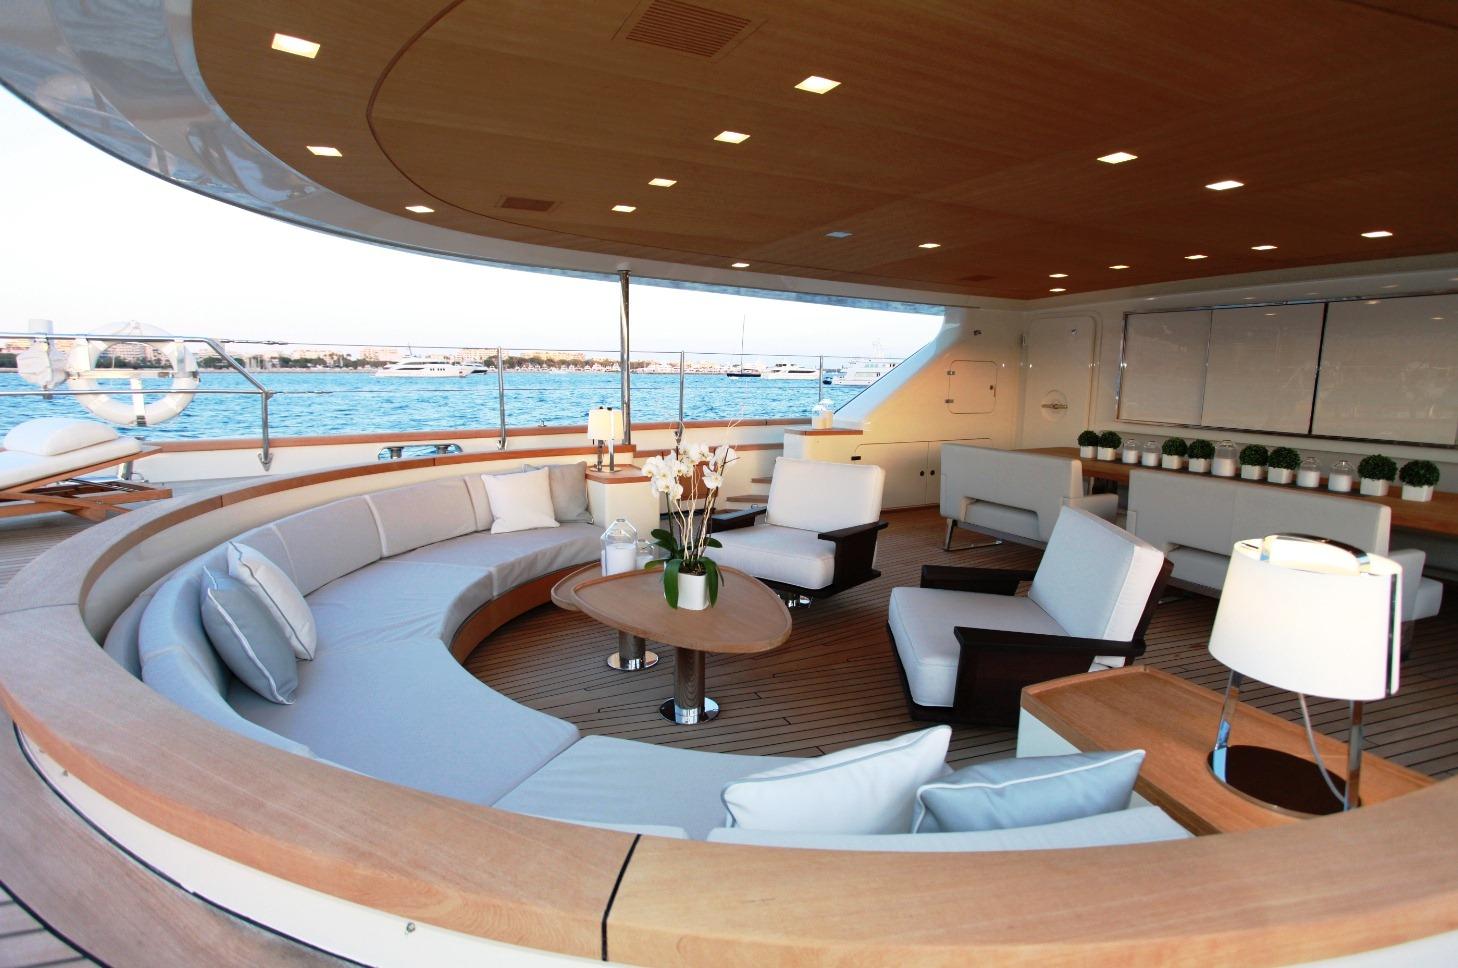 SILENCIO Yacht Aft Deck Seating Yacht Charter